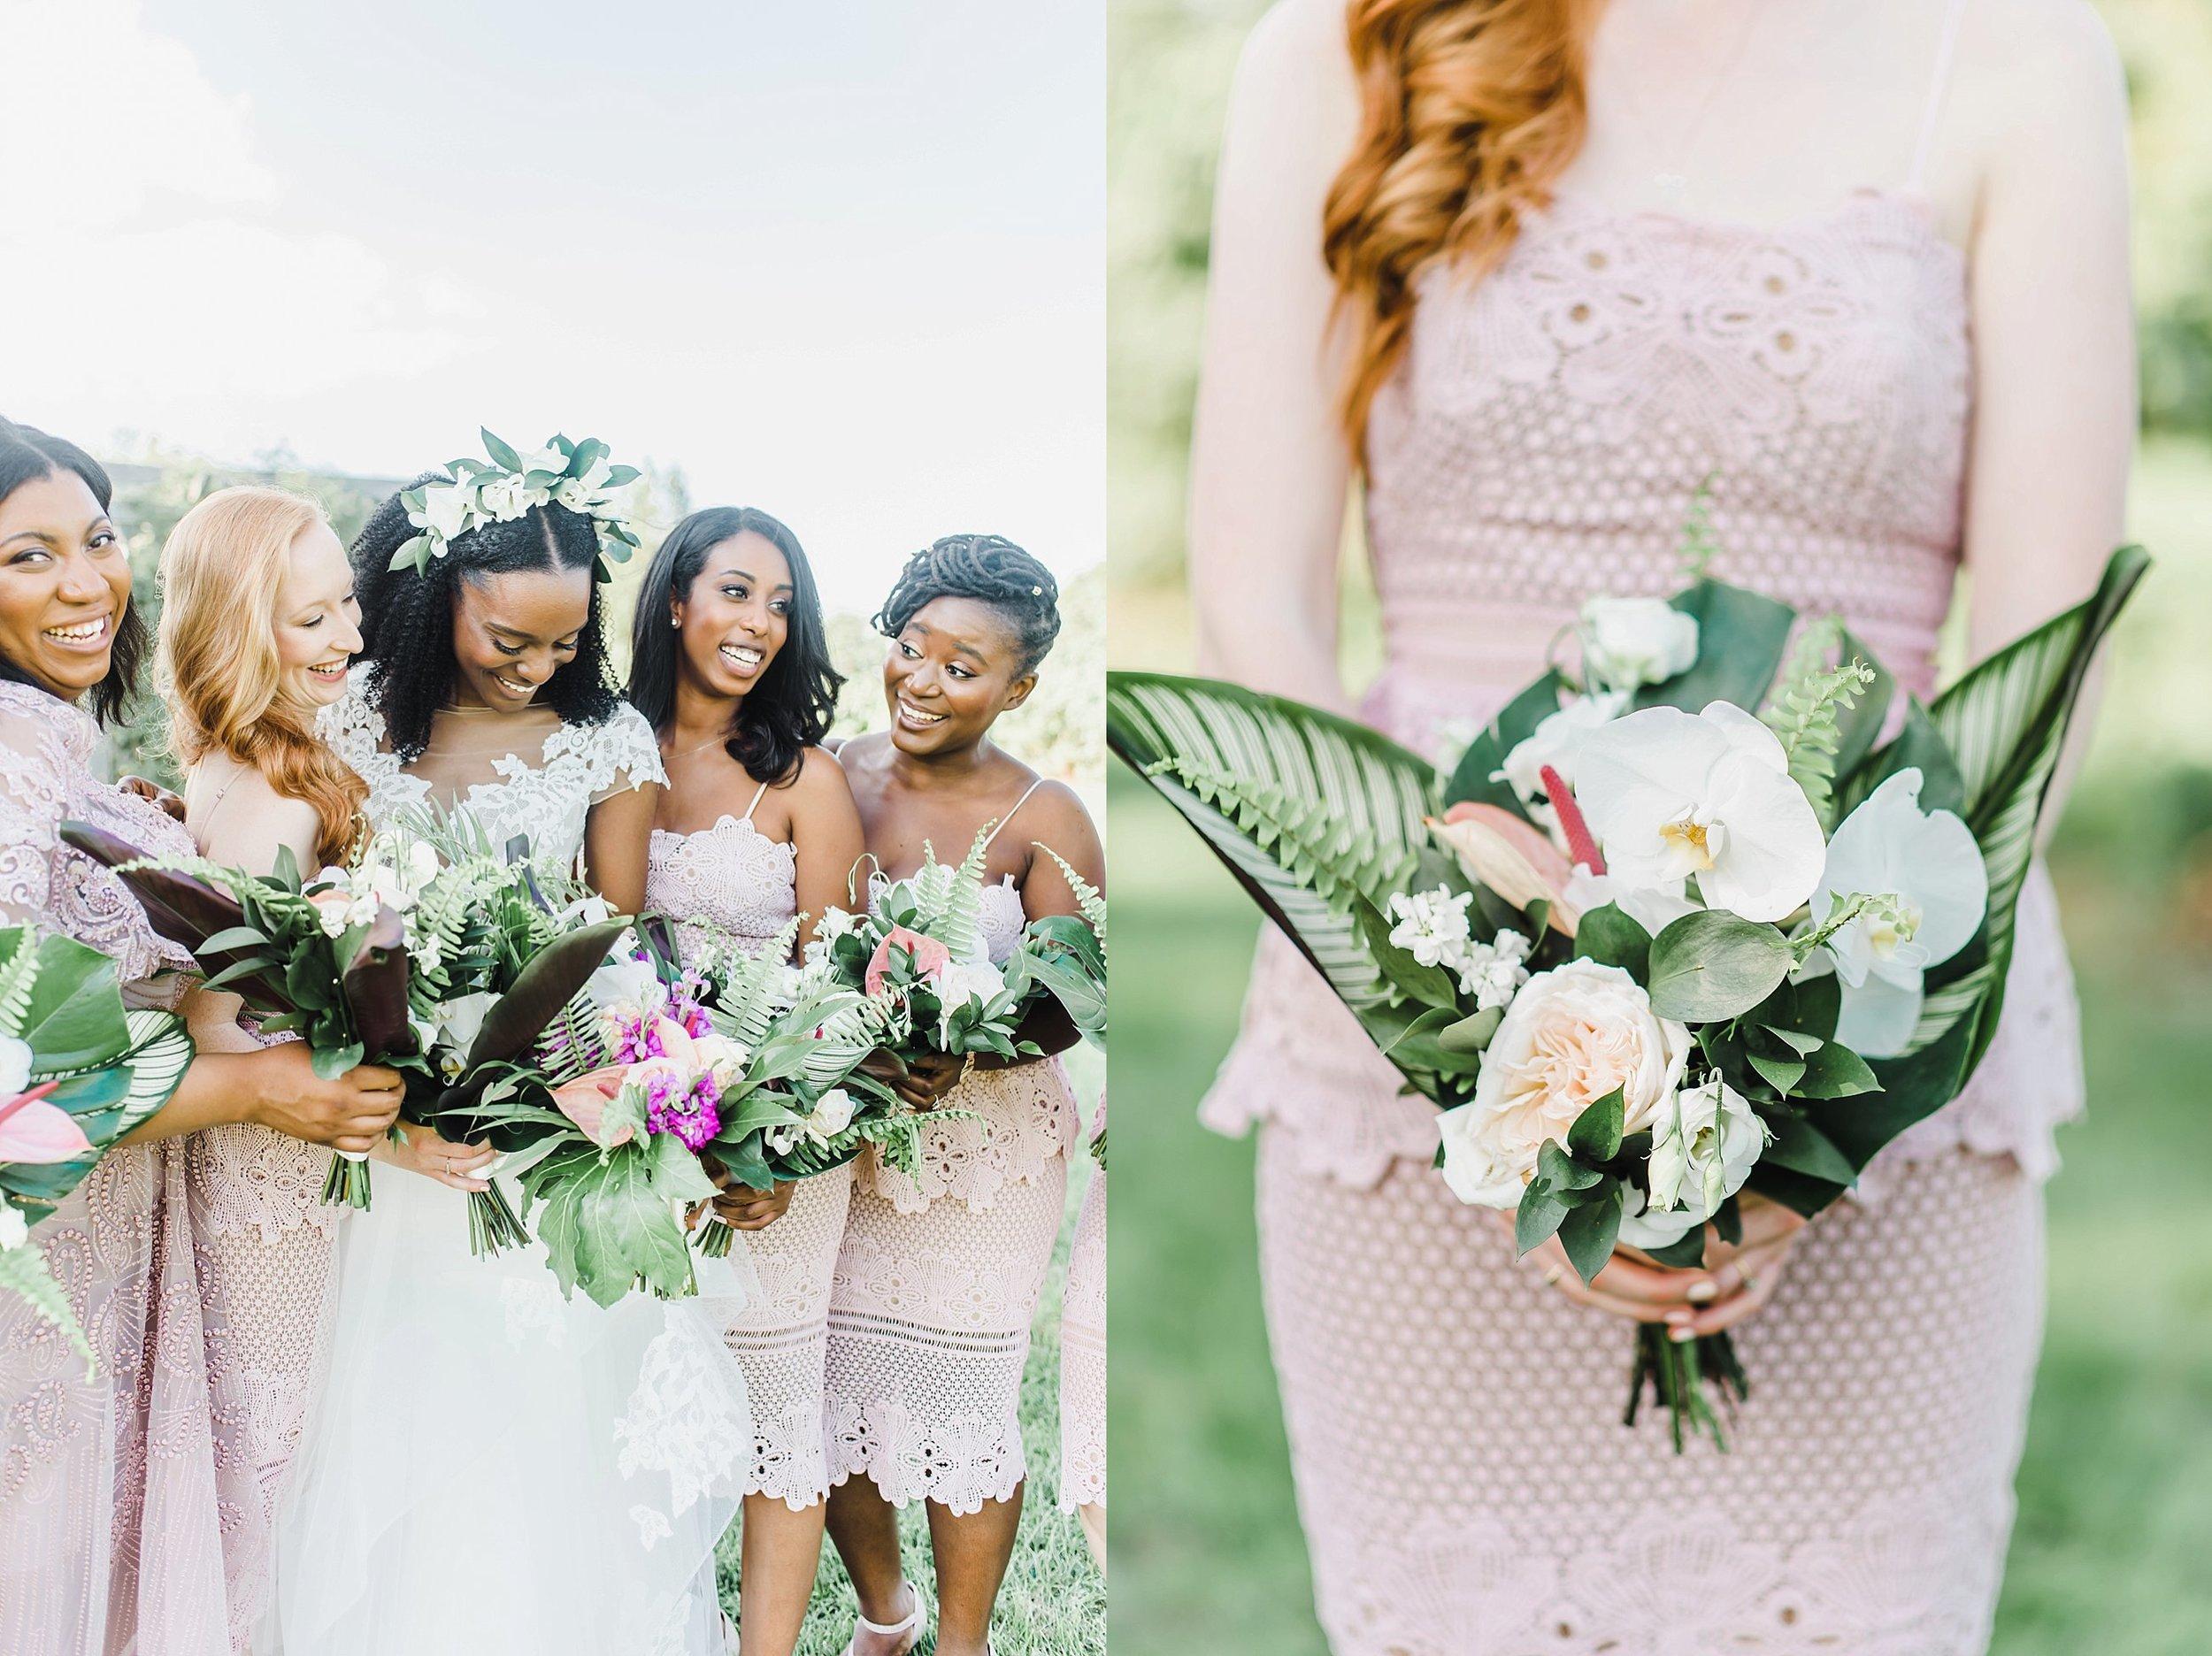 light airy indie fine art ottawa wedding photographer | Ali and Batoul Photography_0988.jpg